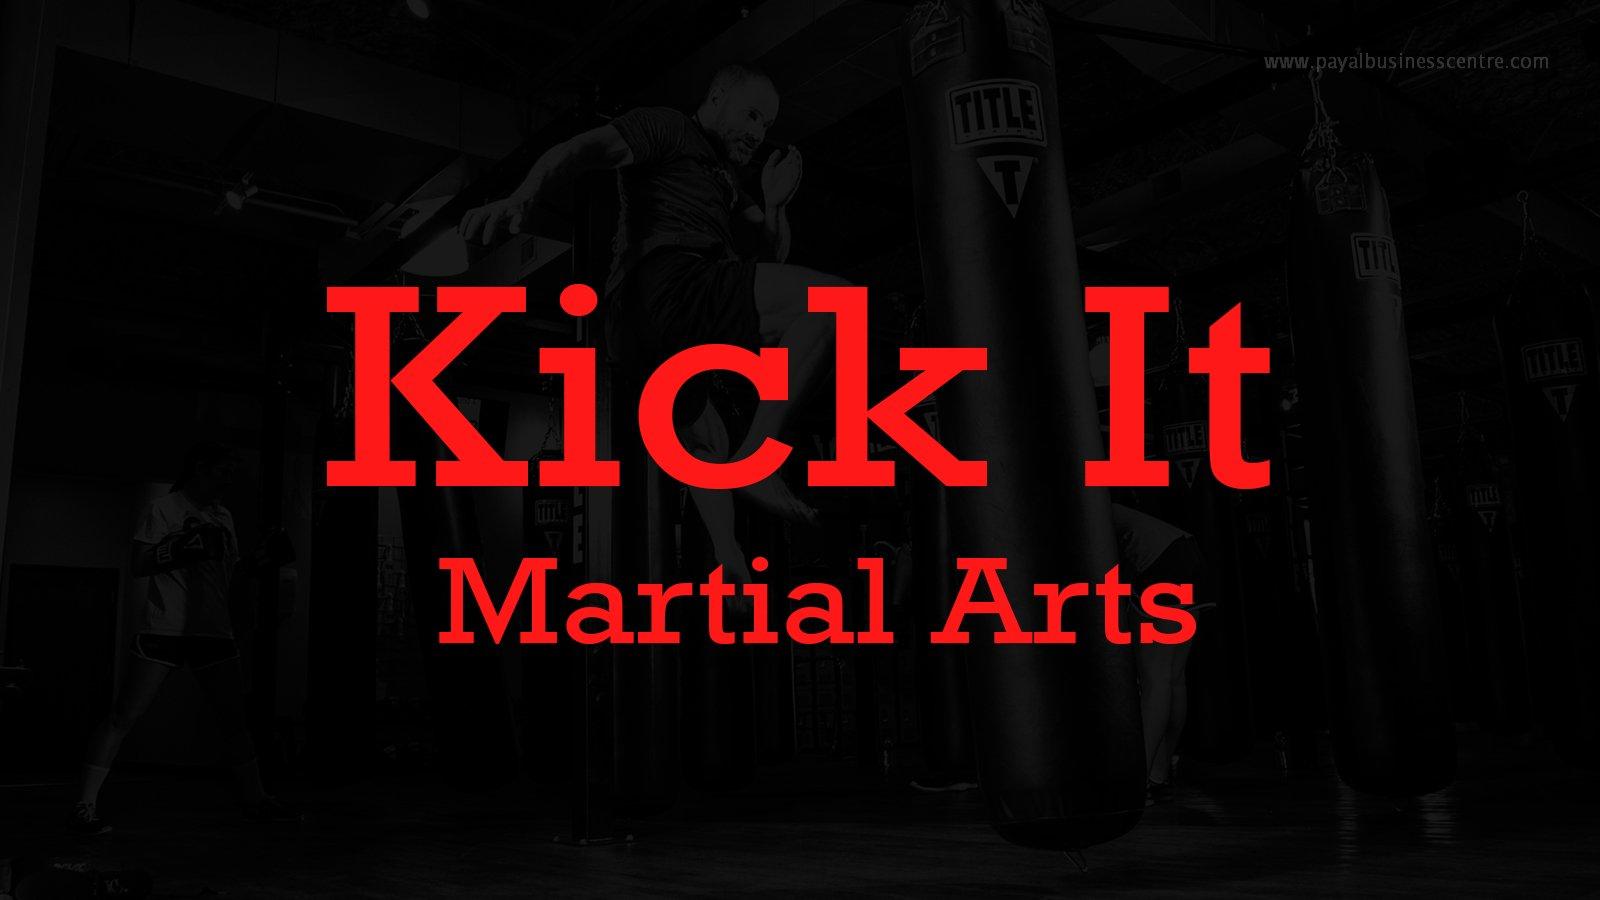 Kick It Martial Arts - Fitness - 12899 80 Ave